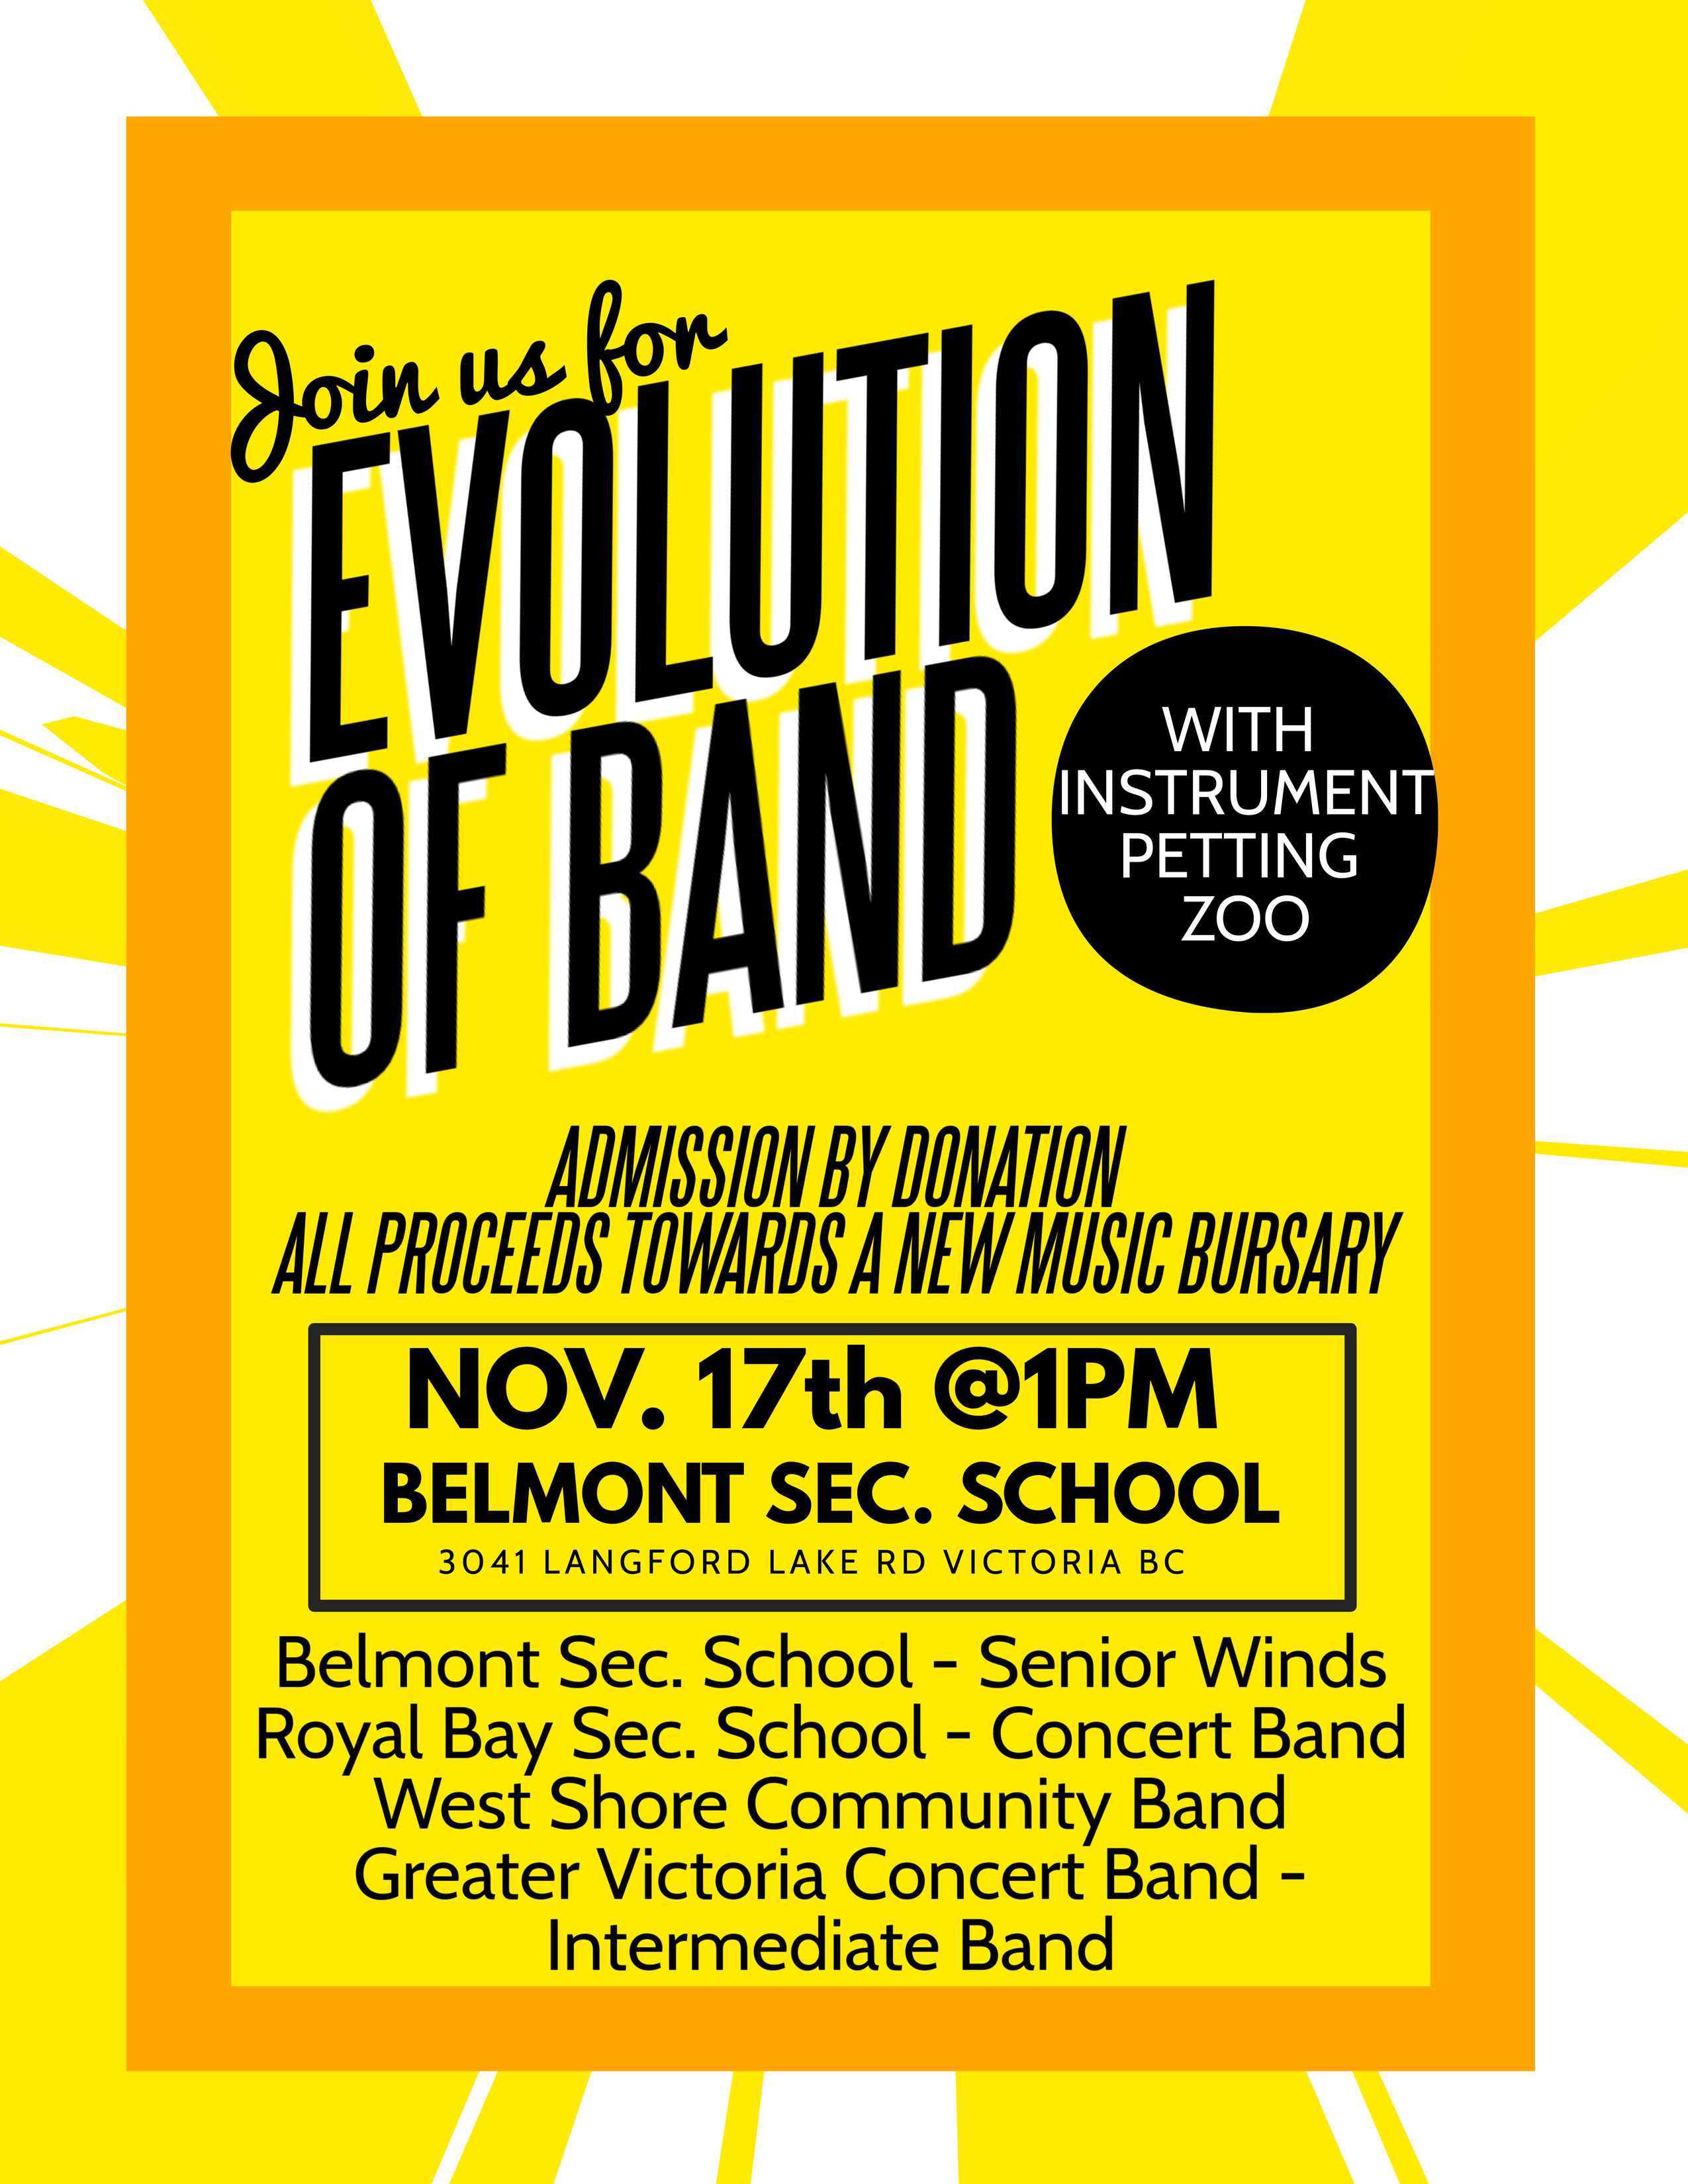 Evolution of Band 2018 Poster